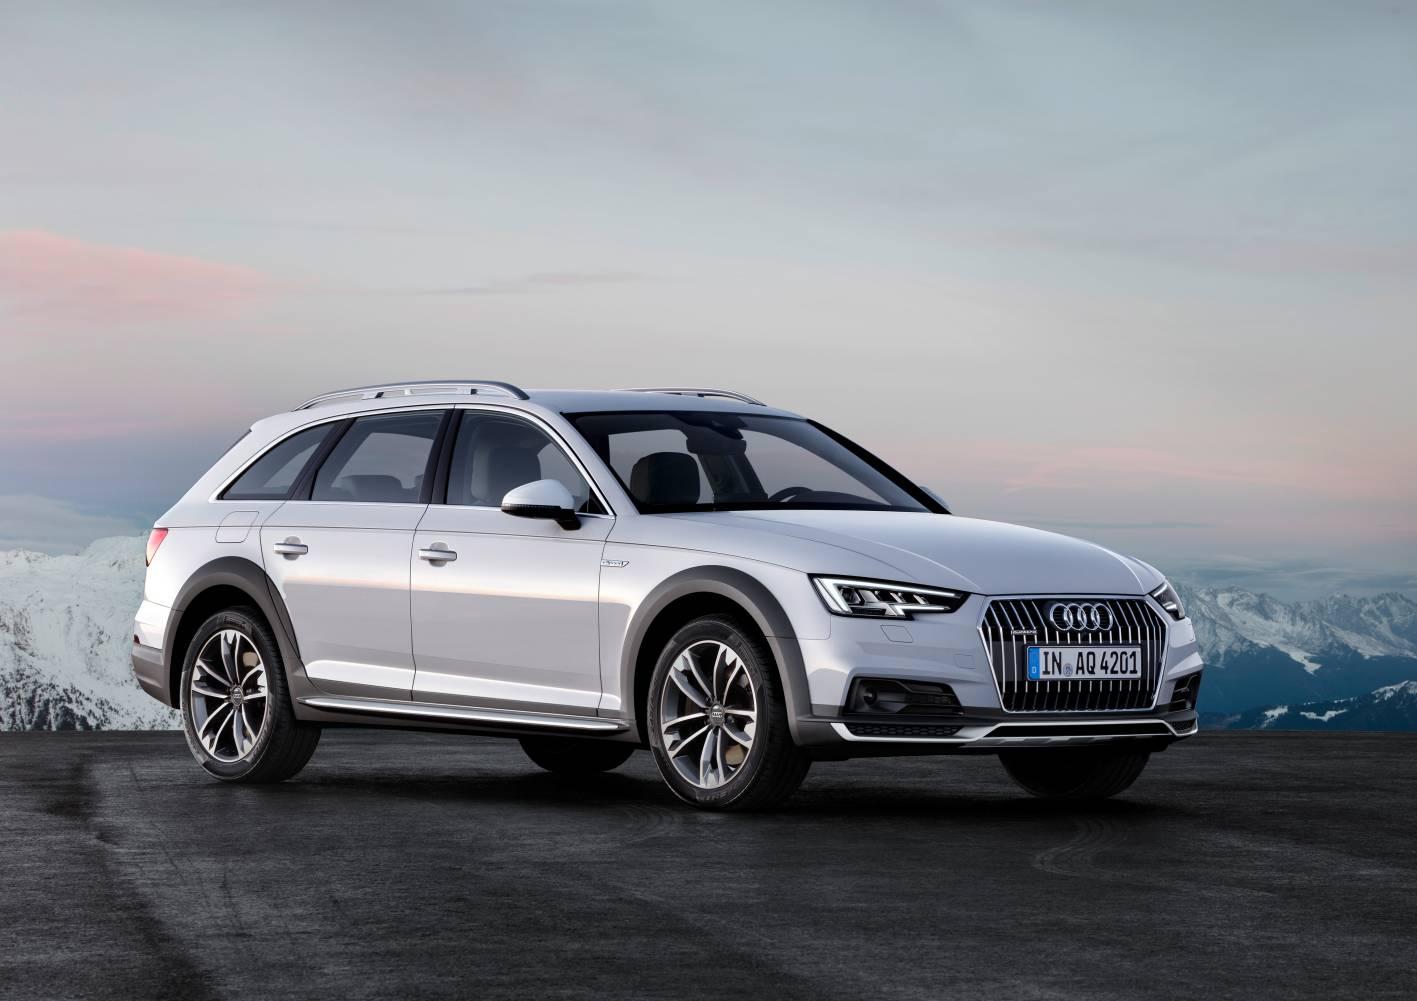 2016 Audi A4 Allroad quattro goes official - ForceGT.com